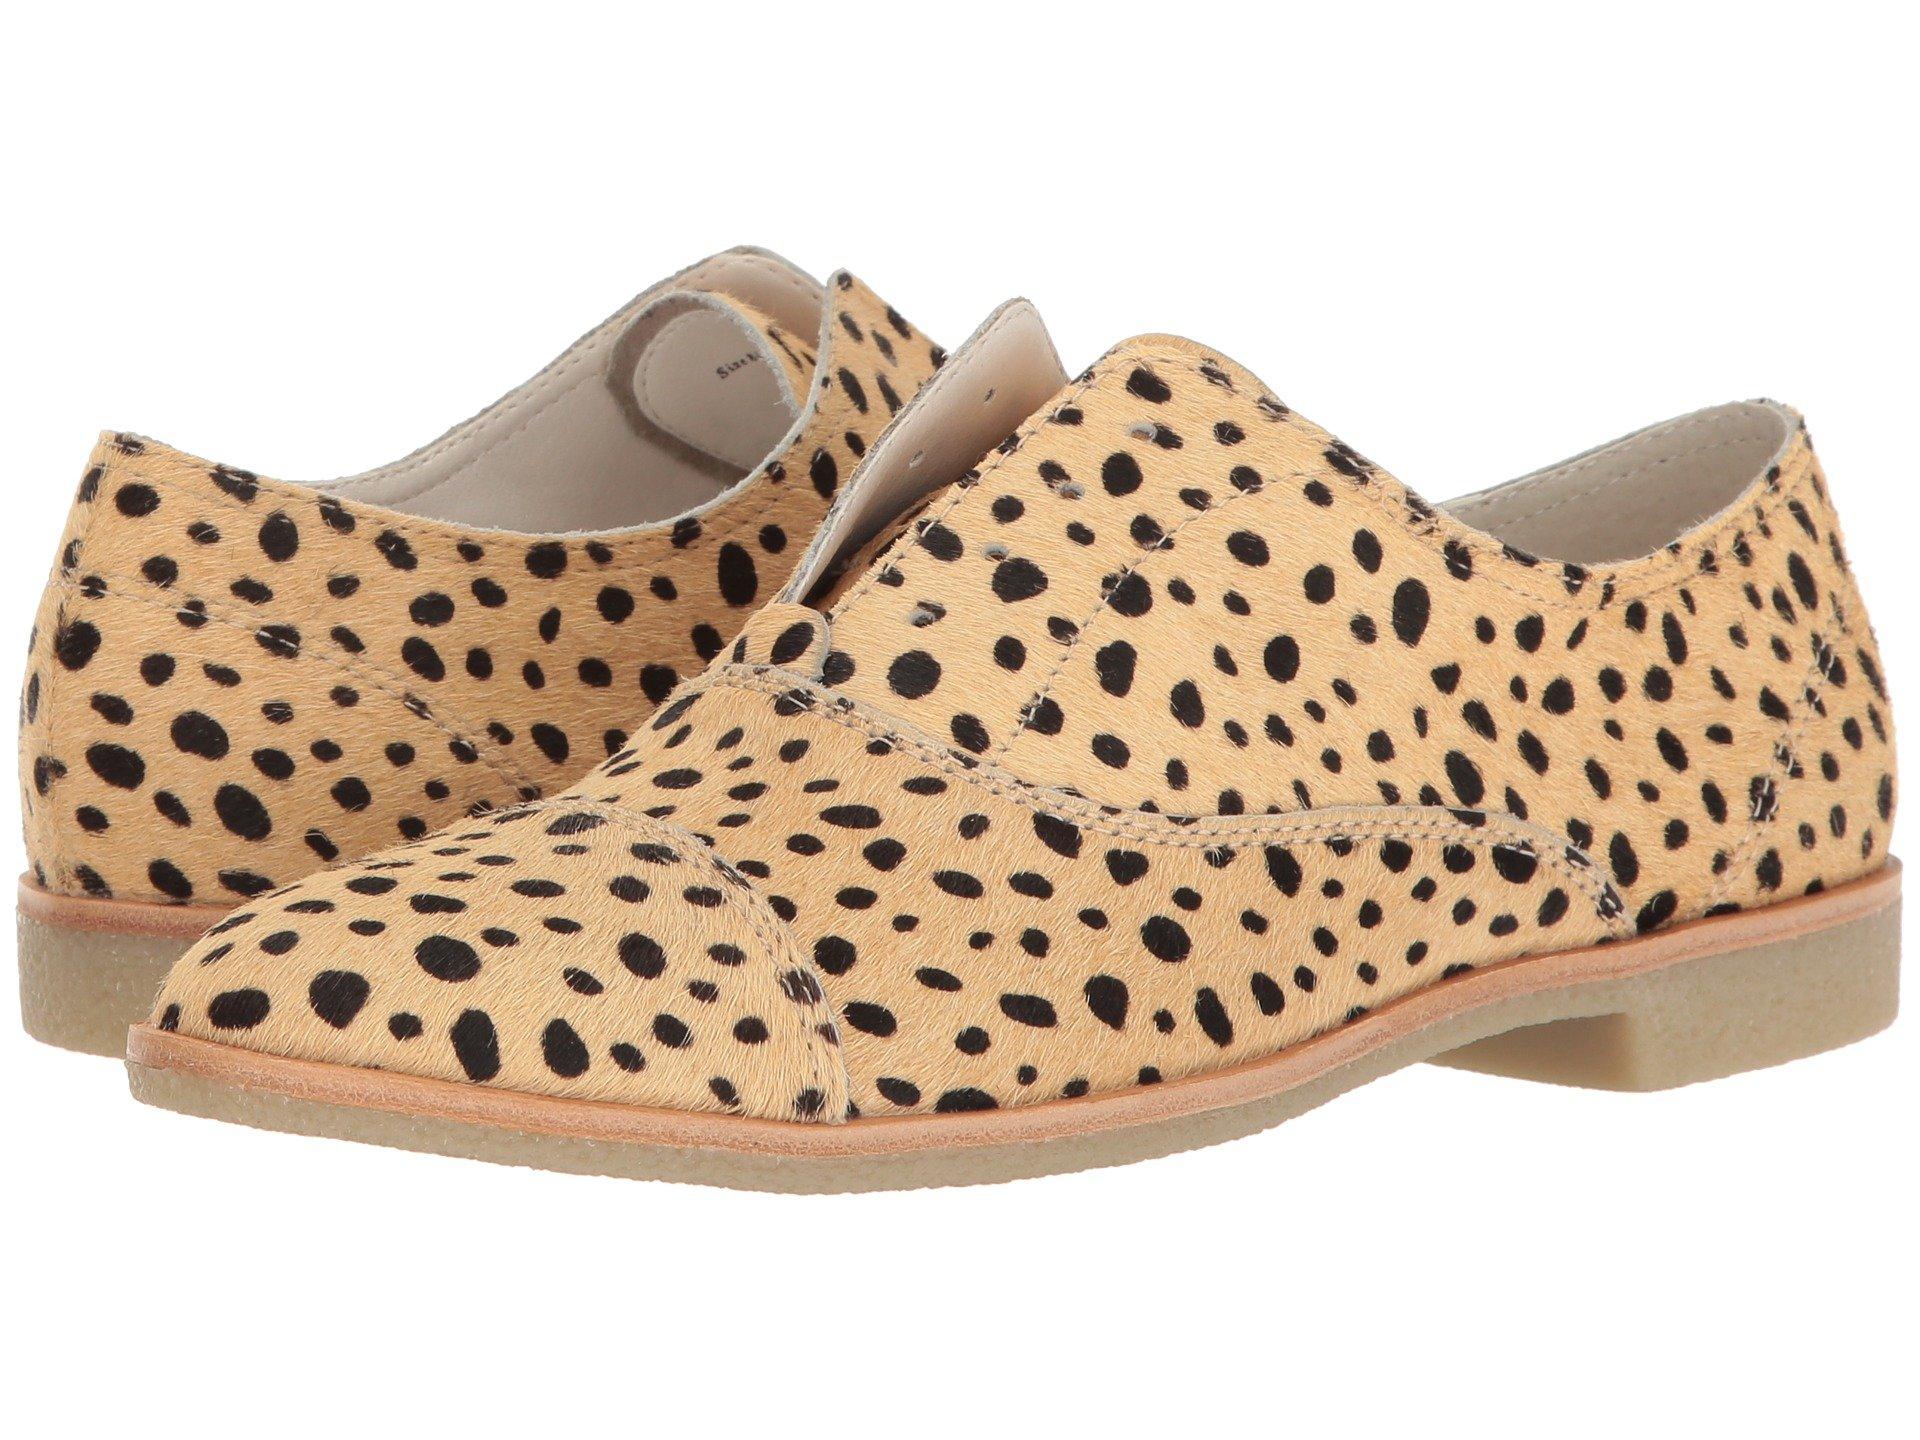 Zapato Casual para Mujer Dolce Vita Cooper  + Dolce Vita en VeoyCompro.net